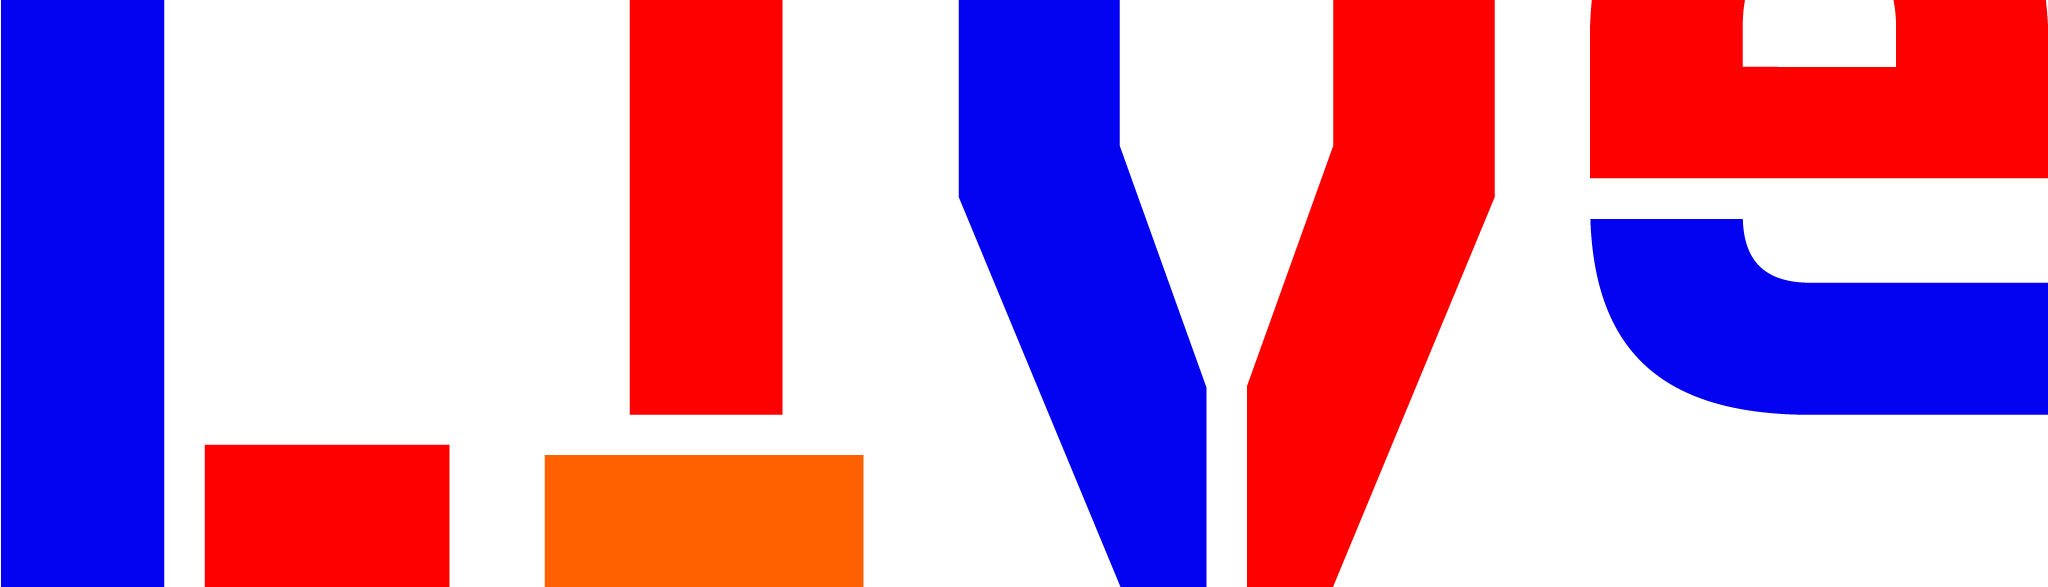 banner_large